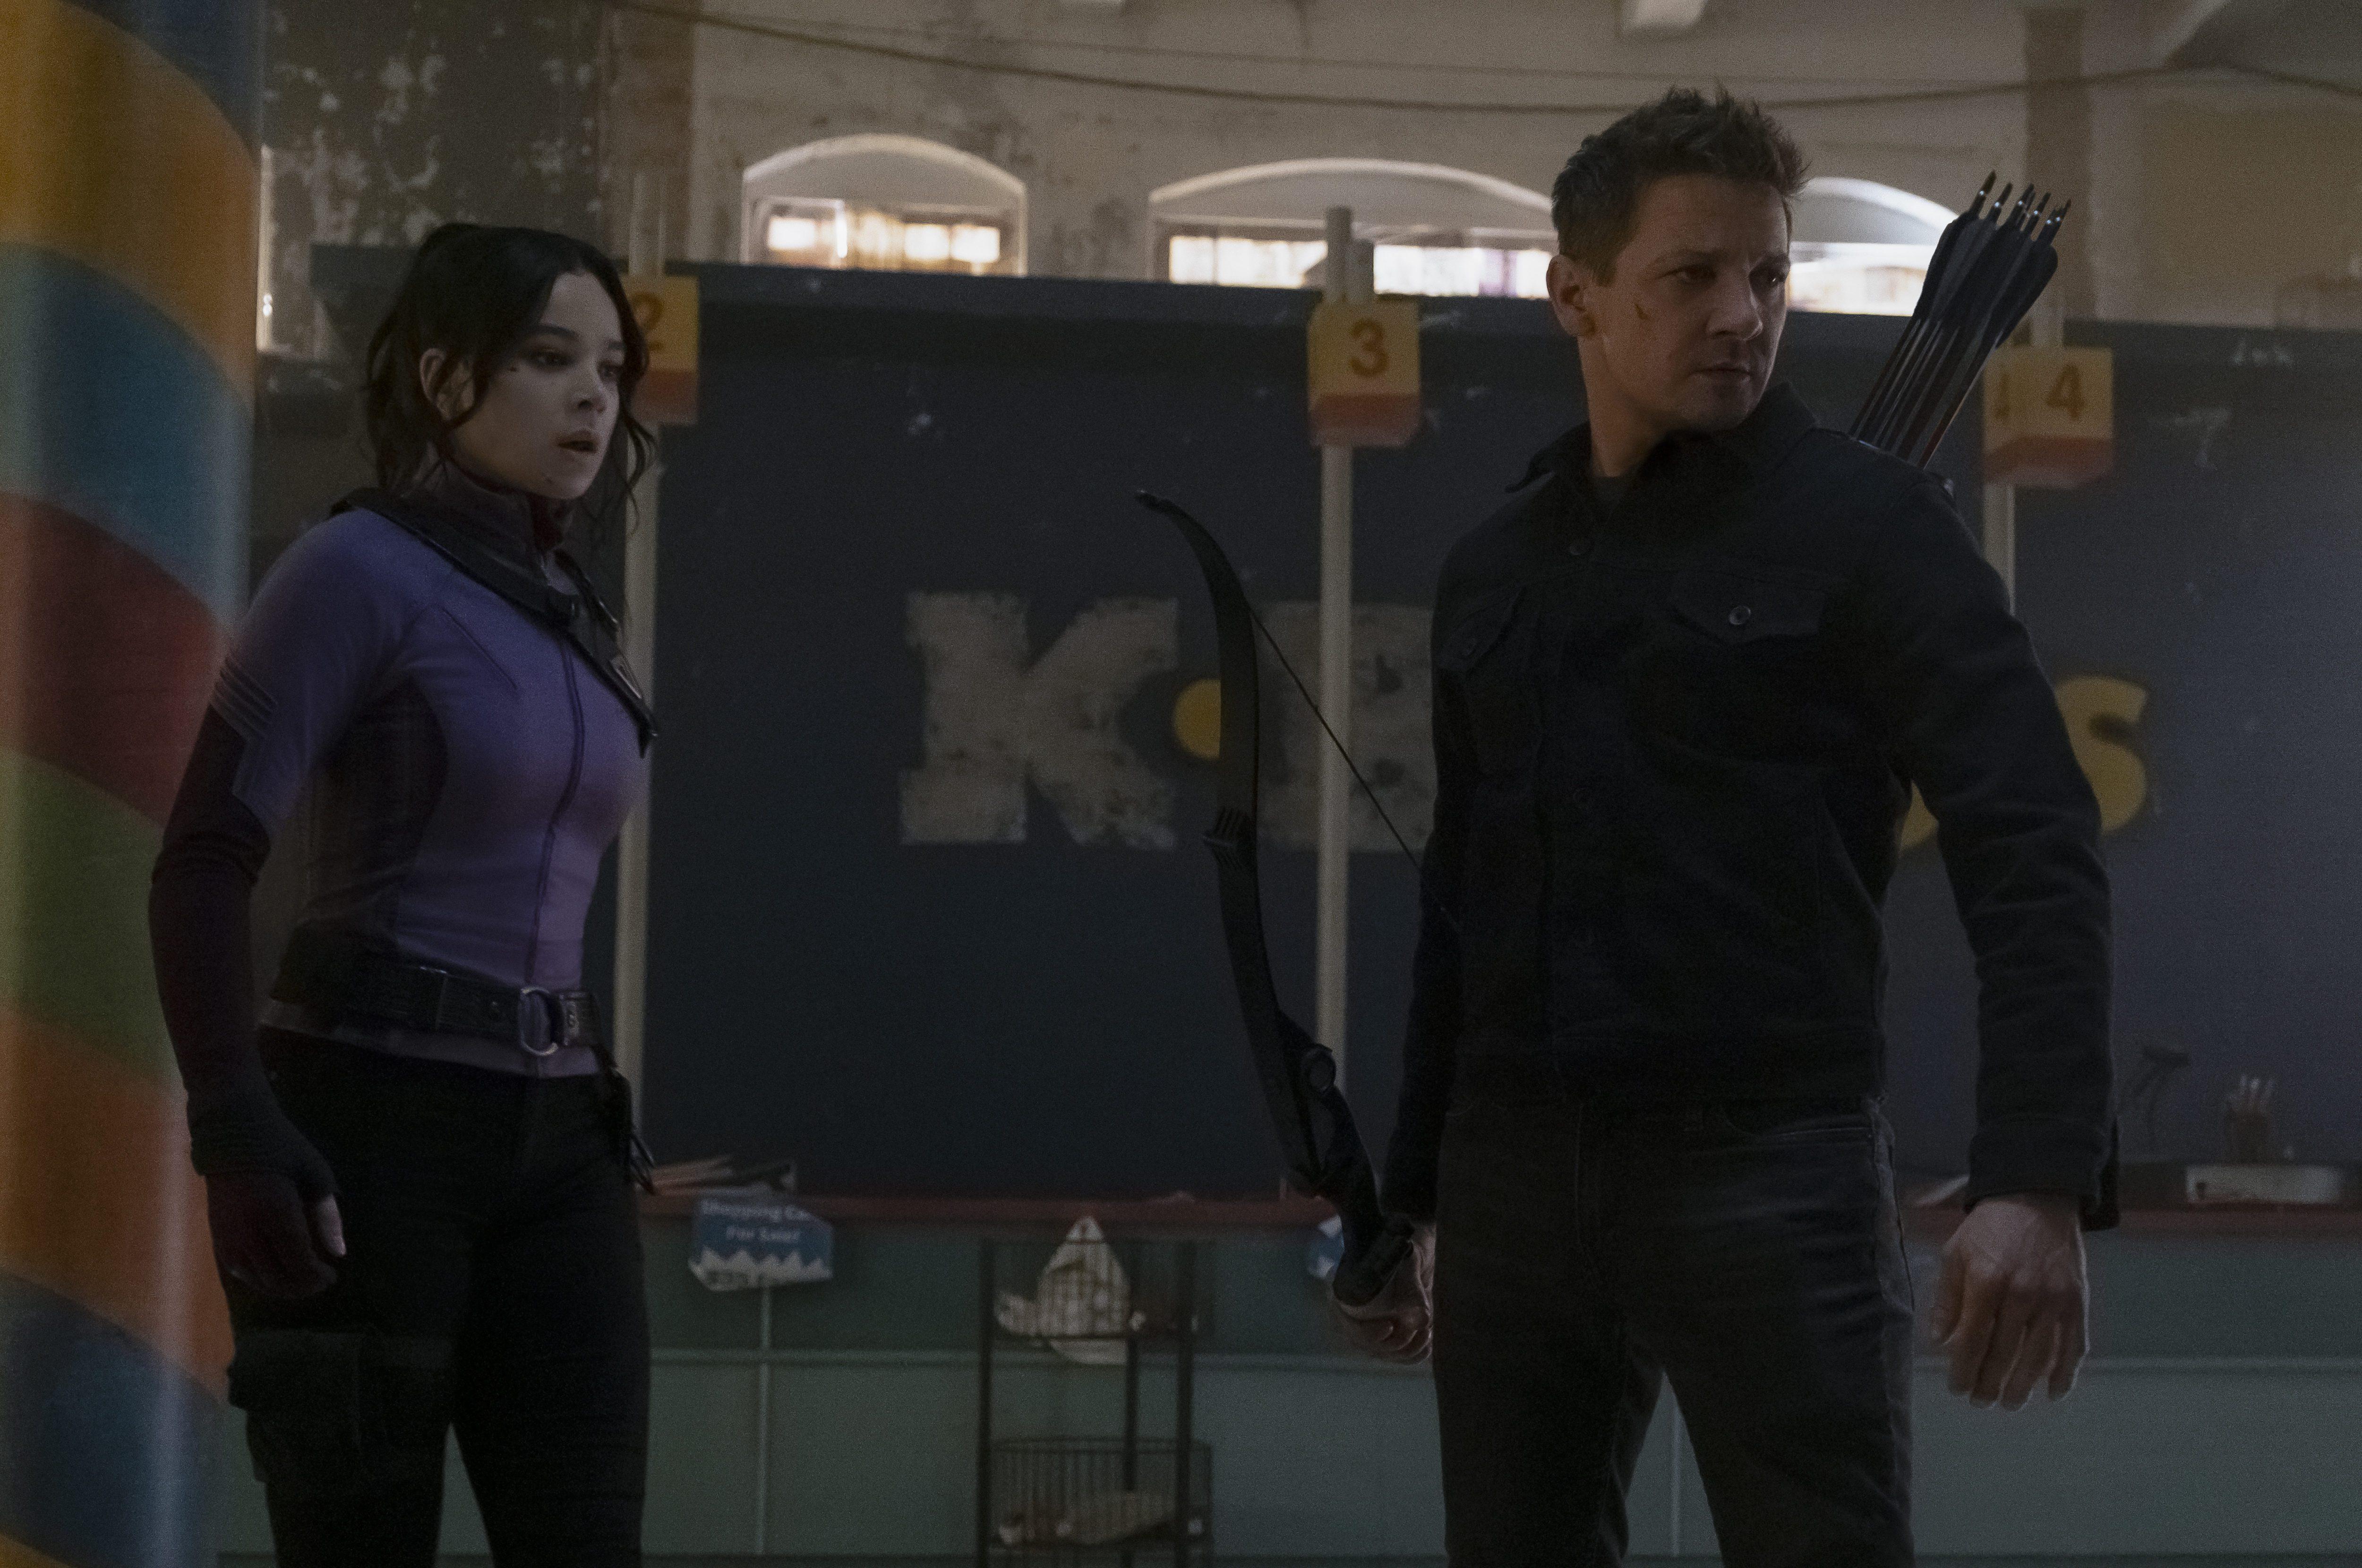 Kate Bishop (Hailee Steinfeld) und Hawkeye/Clint Barton (Jeremy Renner) in Marvel Studios' HAWKEYE